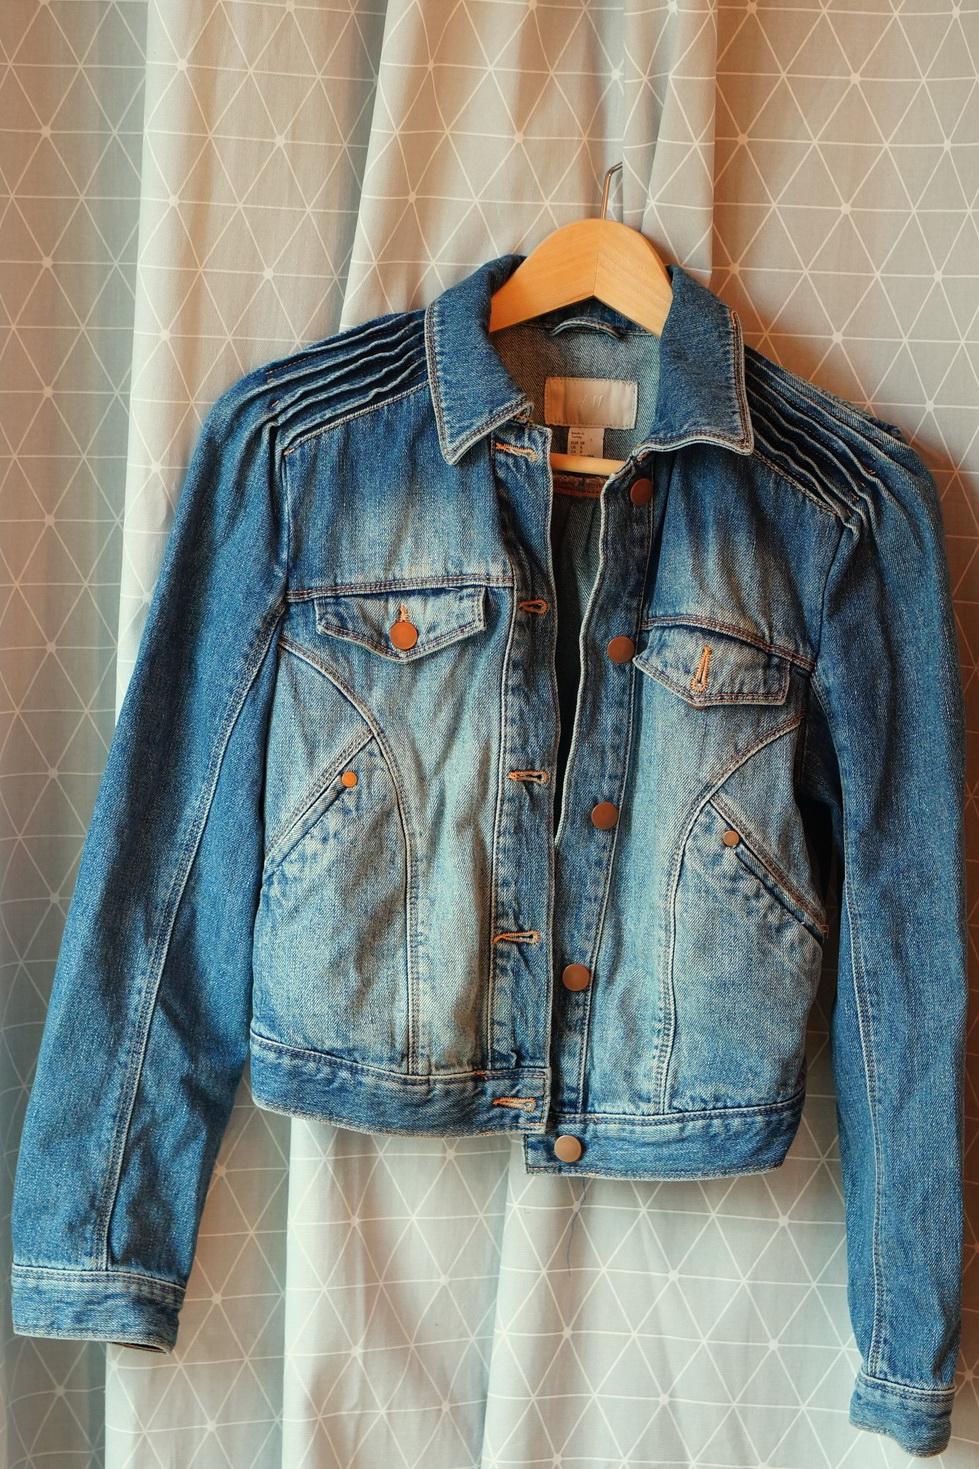 brocante, vide-grenier, vêtements de seconde main, veste en jean h&m, veste en jean